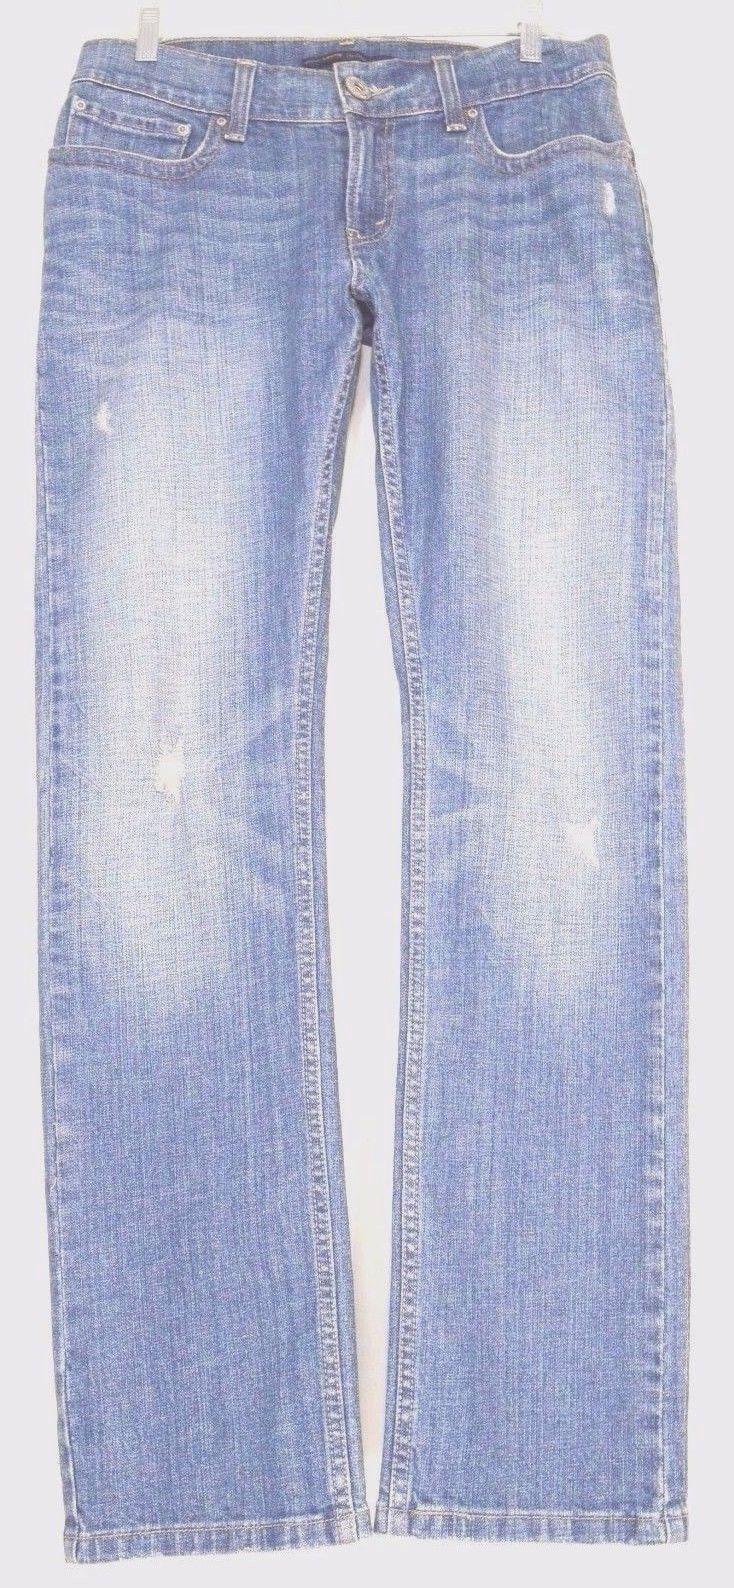 Levi 542 jeans slouch 8 x 32 low pencil flap back pockets boho long sexy W33